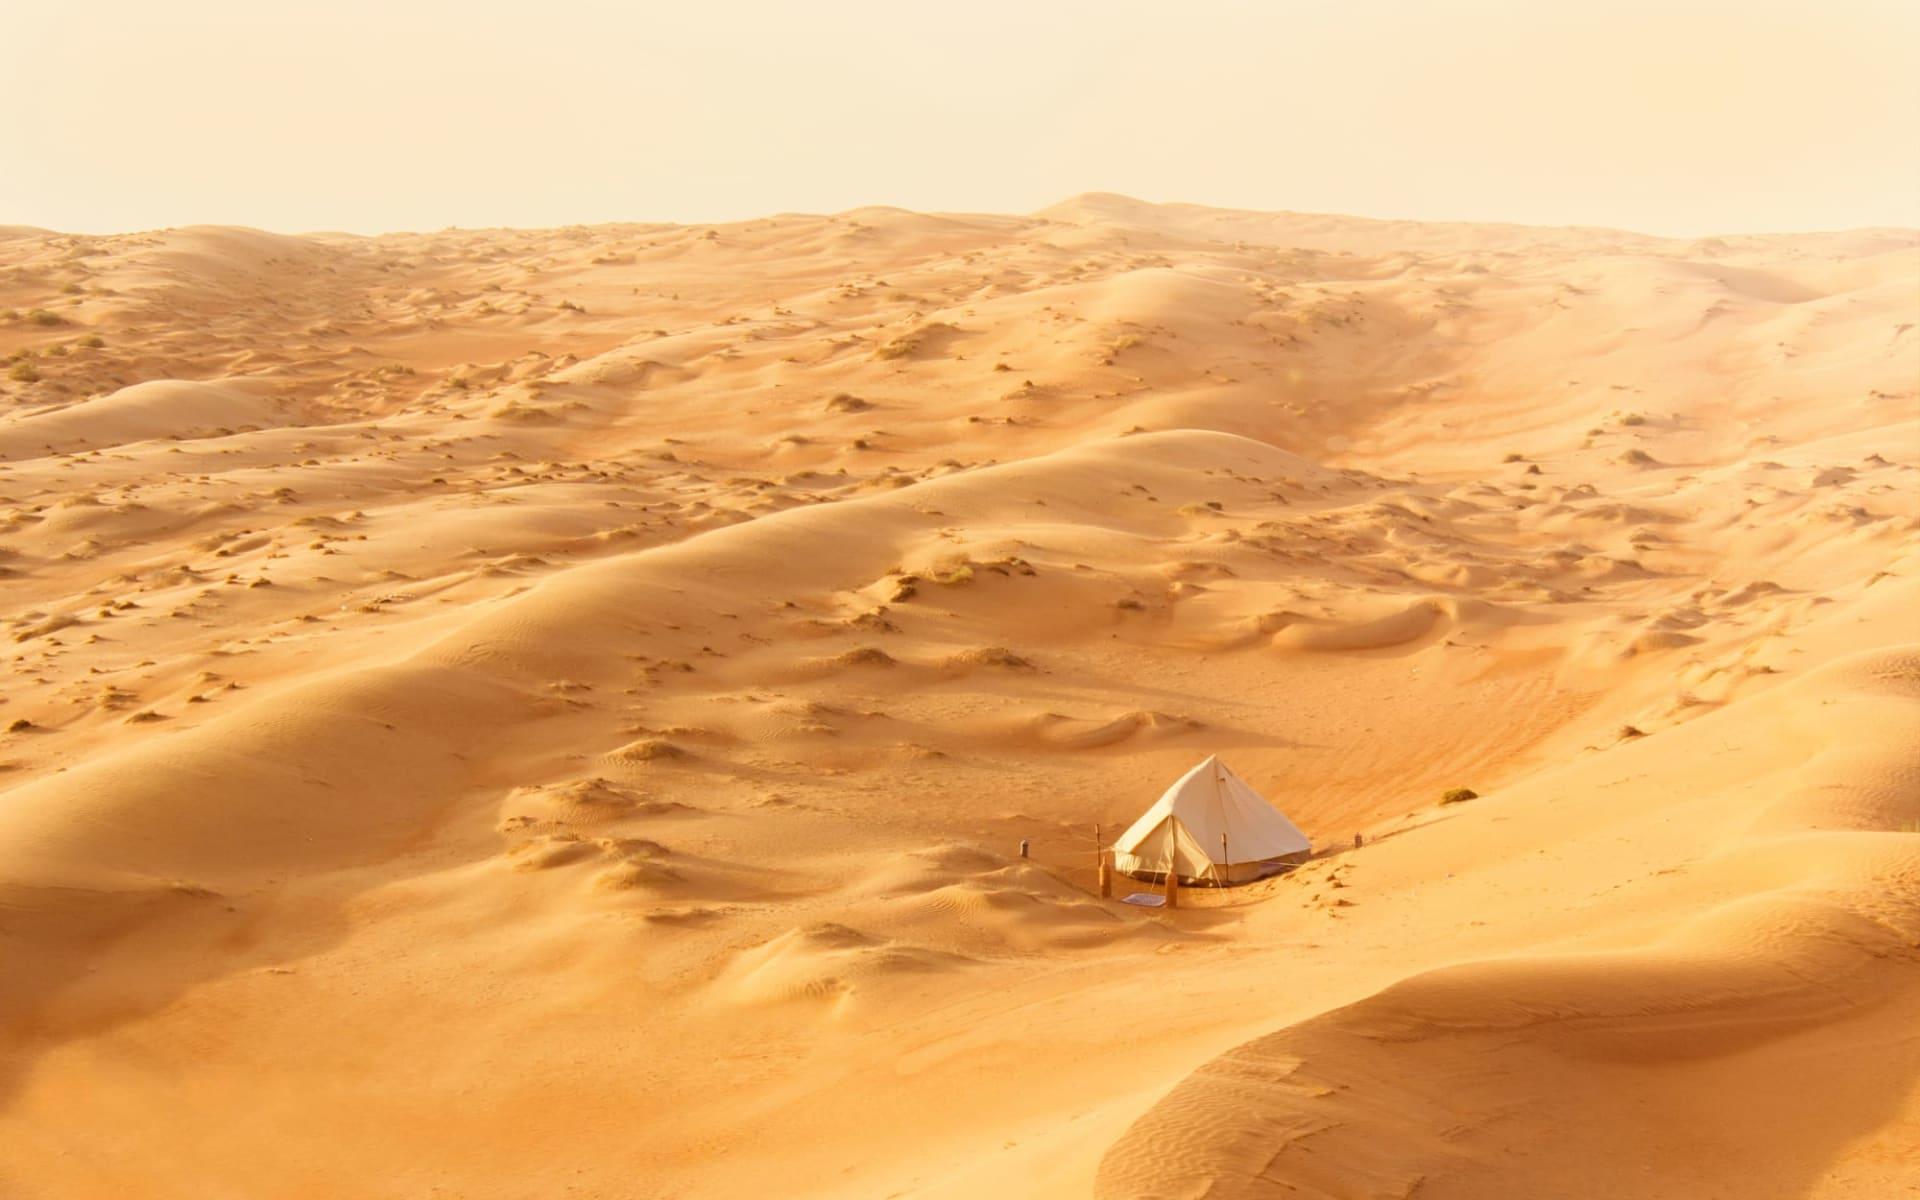 Luxus-Camping in der Wüste & faszinierende Berglandschaften ab Muscat: Canvas Club Glamping Oman